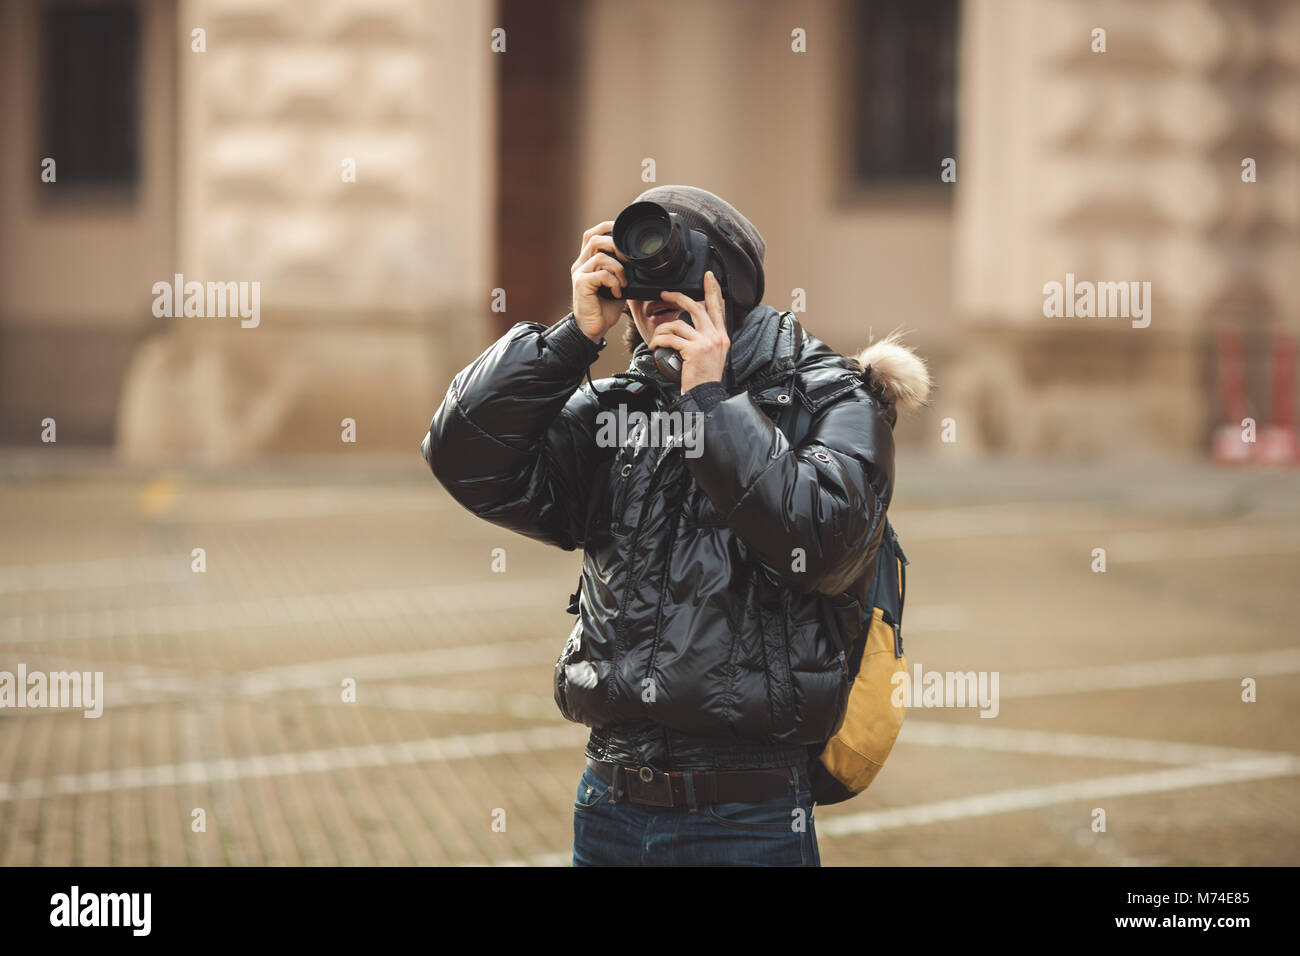 Tourist Man shooting in Prague, walking on the streets - Stock Image